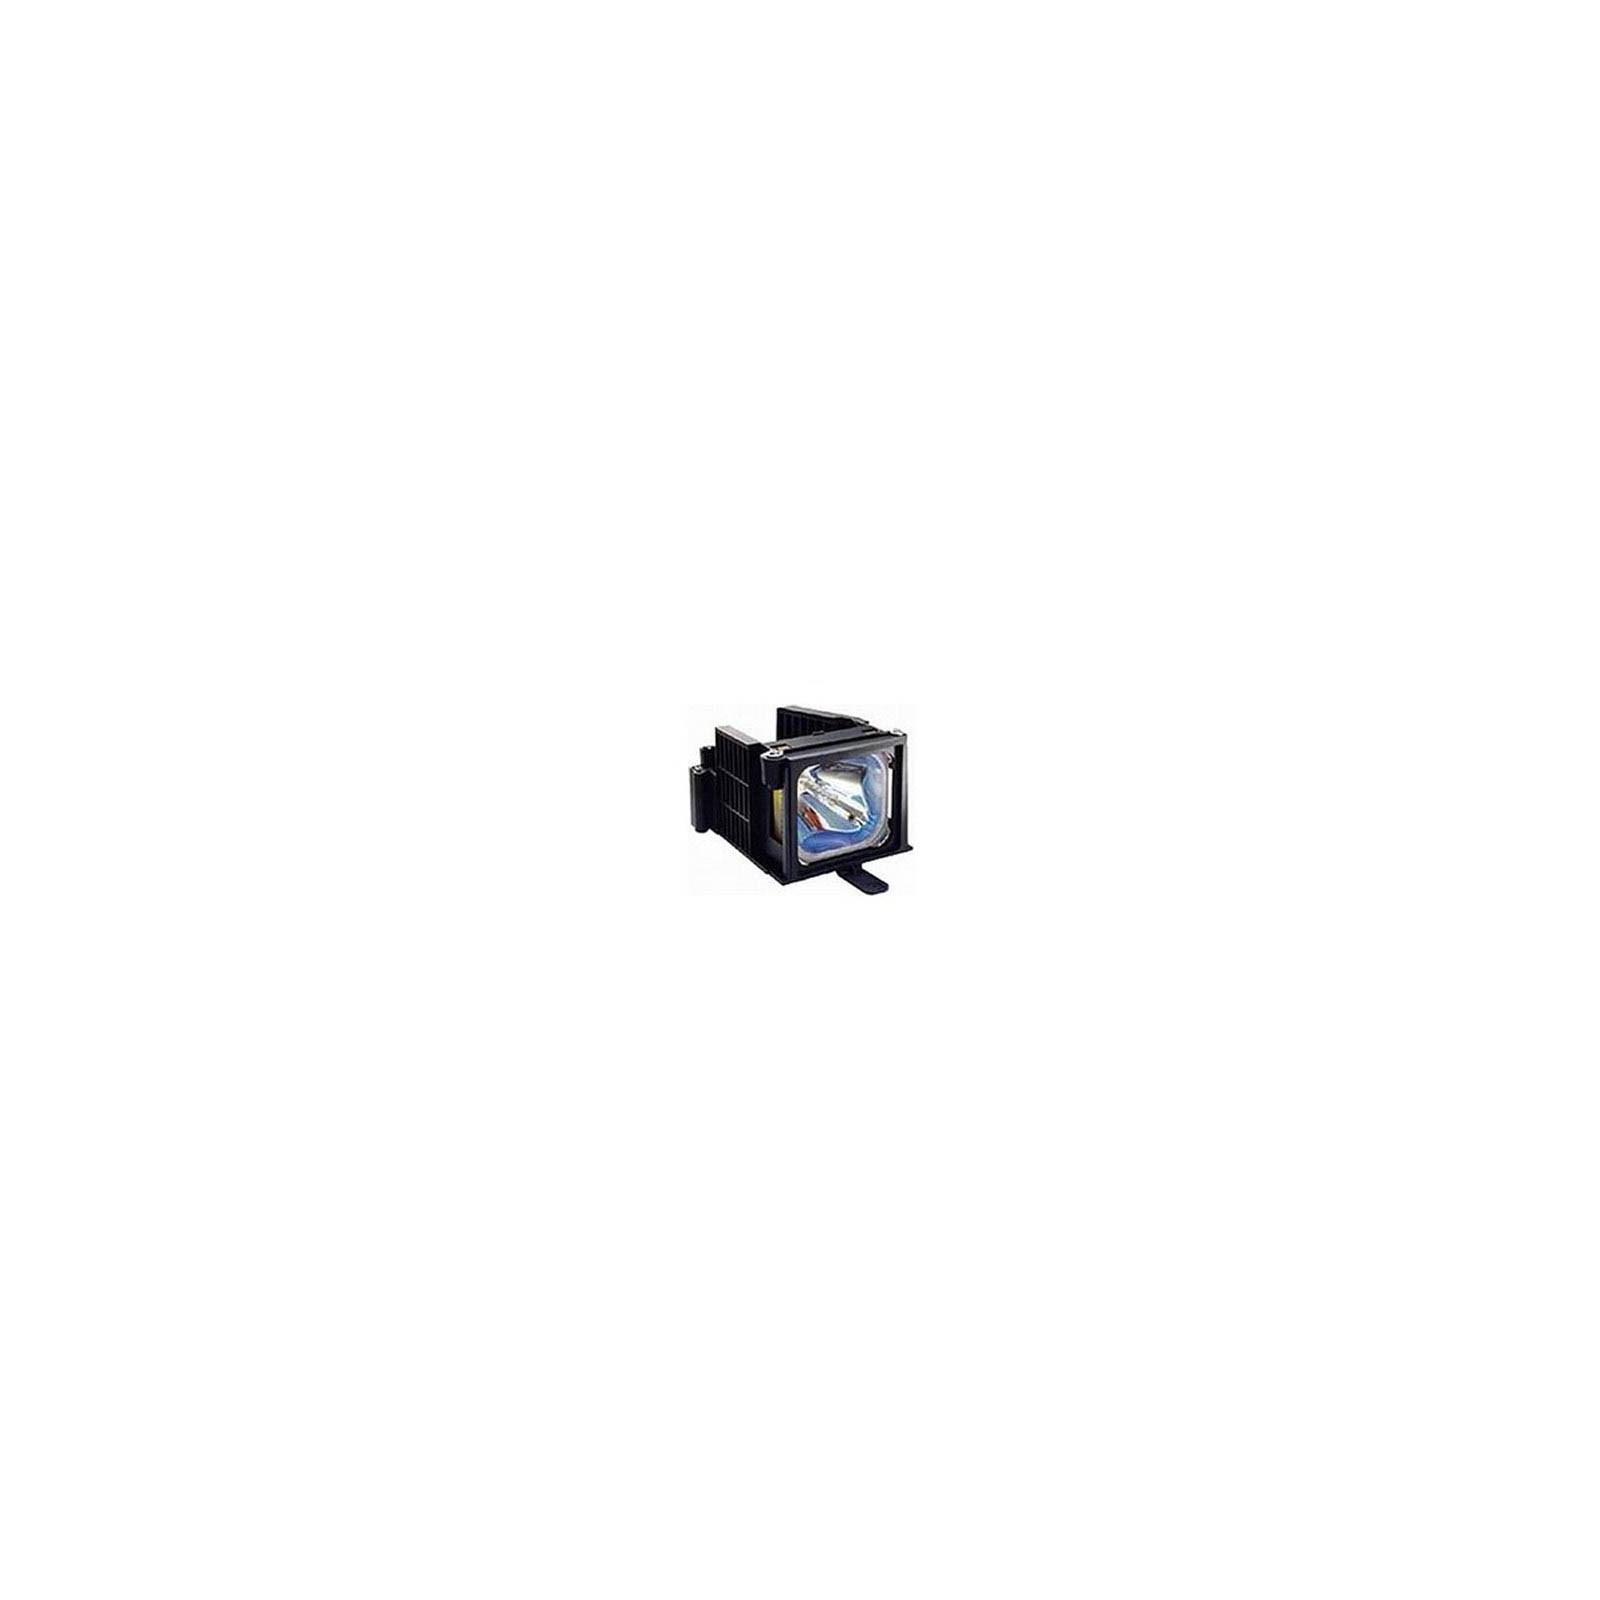 Лампа проектора Acer P7205 Lamp (EC.JBM00.001)